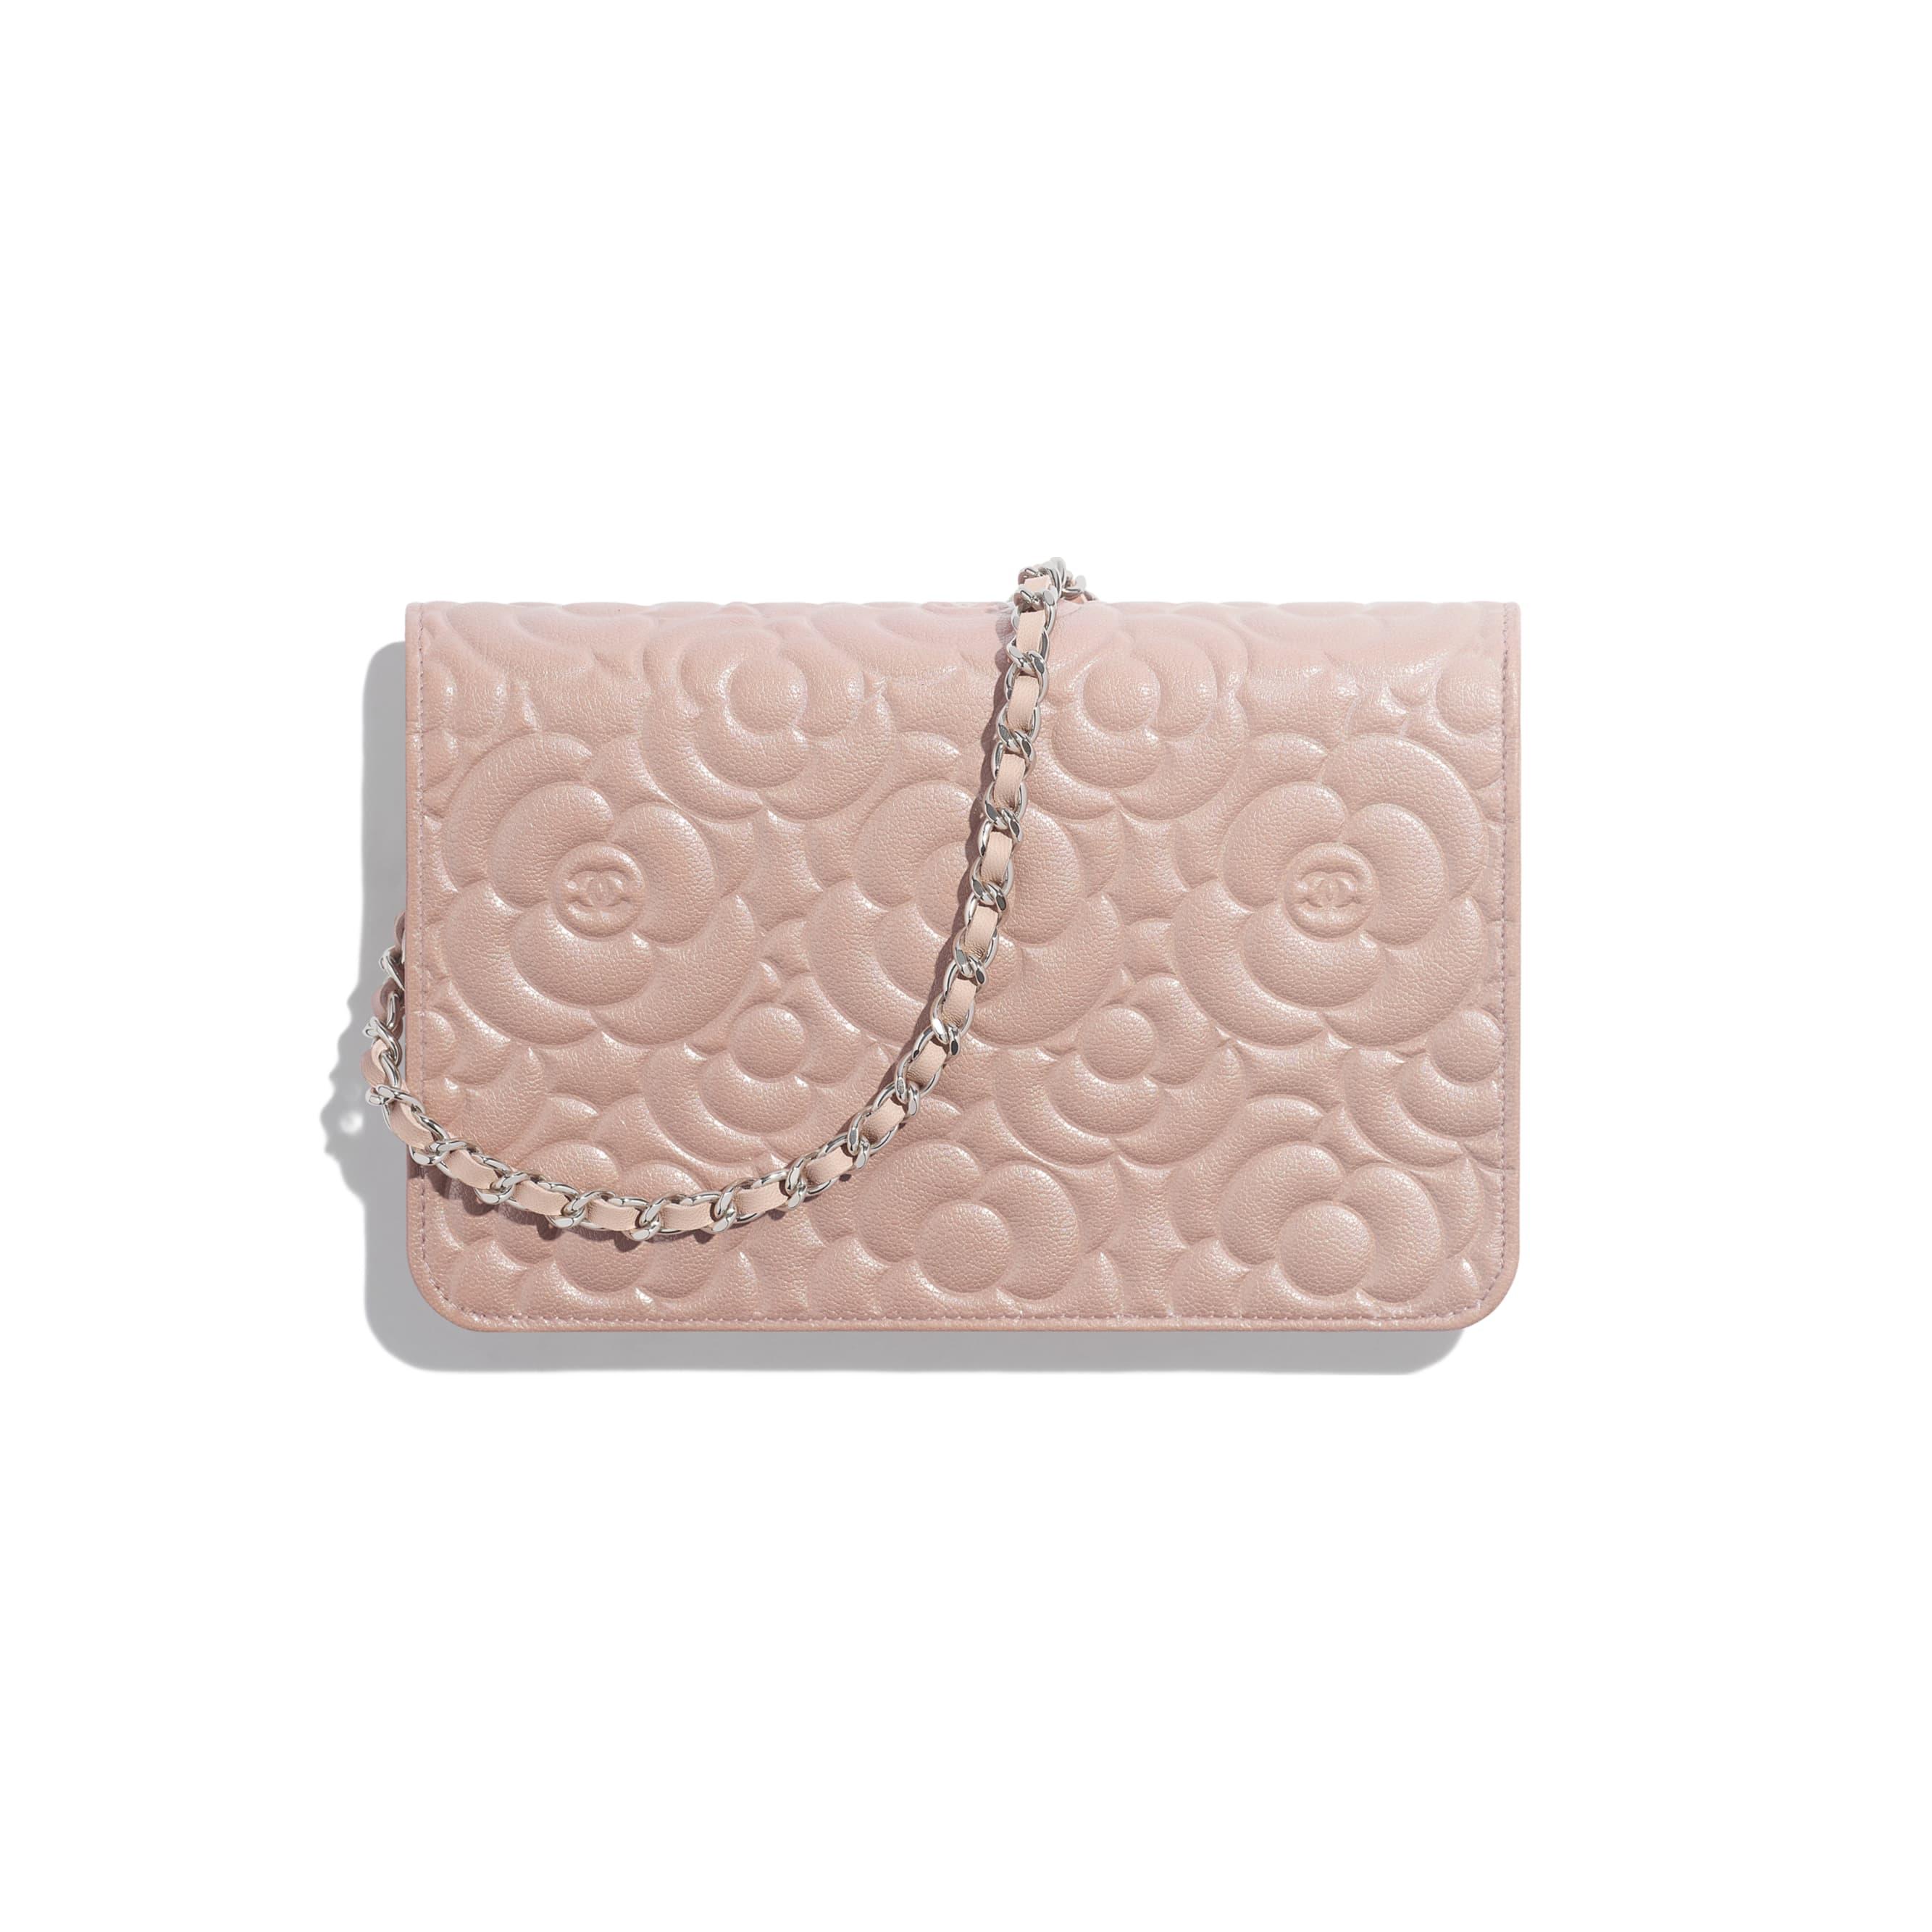 Wallet on Chain - Light Pink - Satin Finish Goatskin & Silver-Tone Metal - Alternative view - see standard sized version